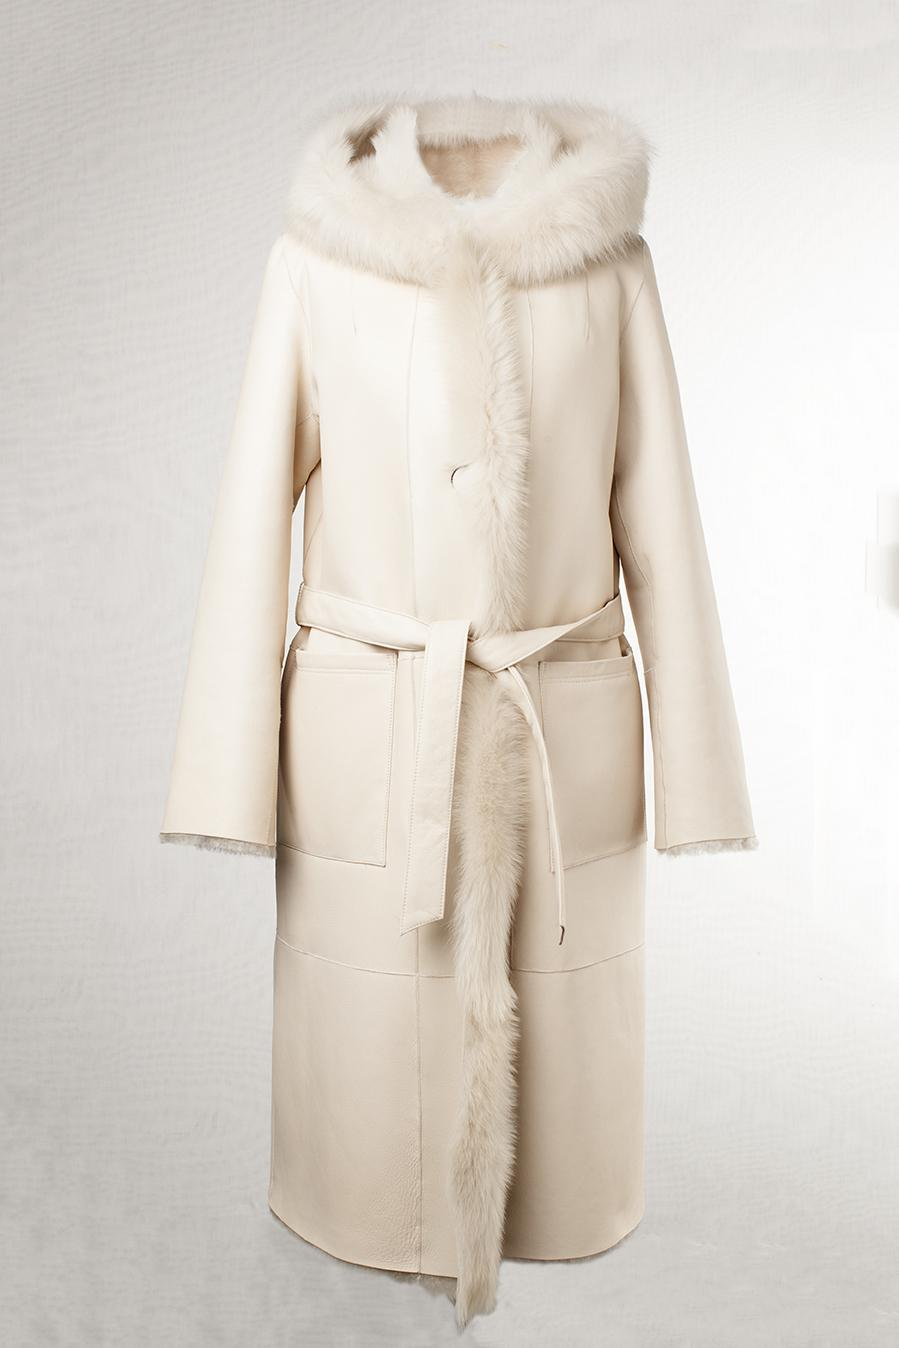 Reversible ironed lacon & toscana angora silky 108cm